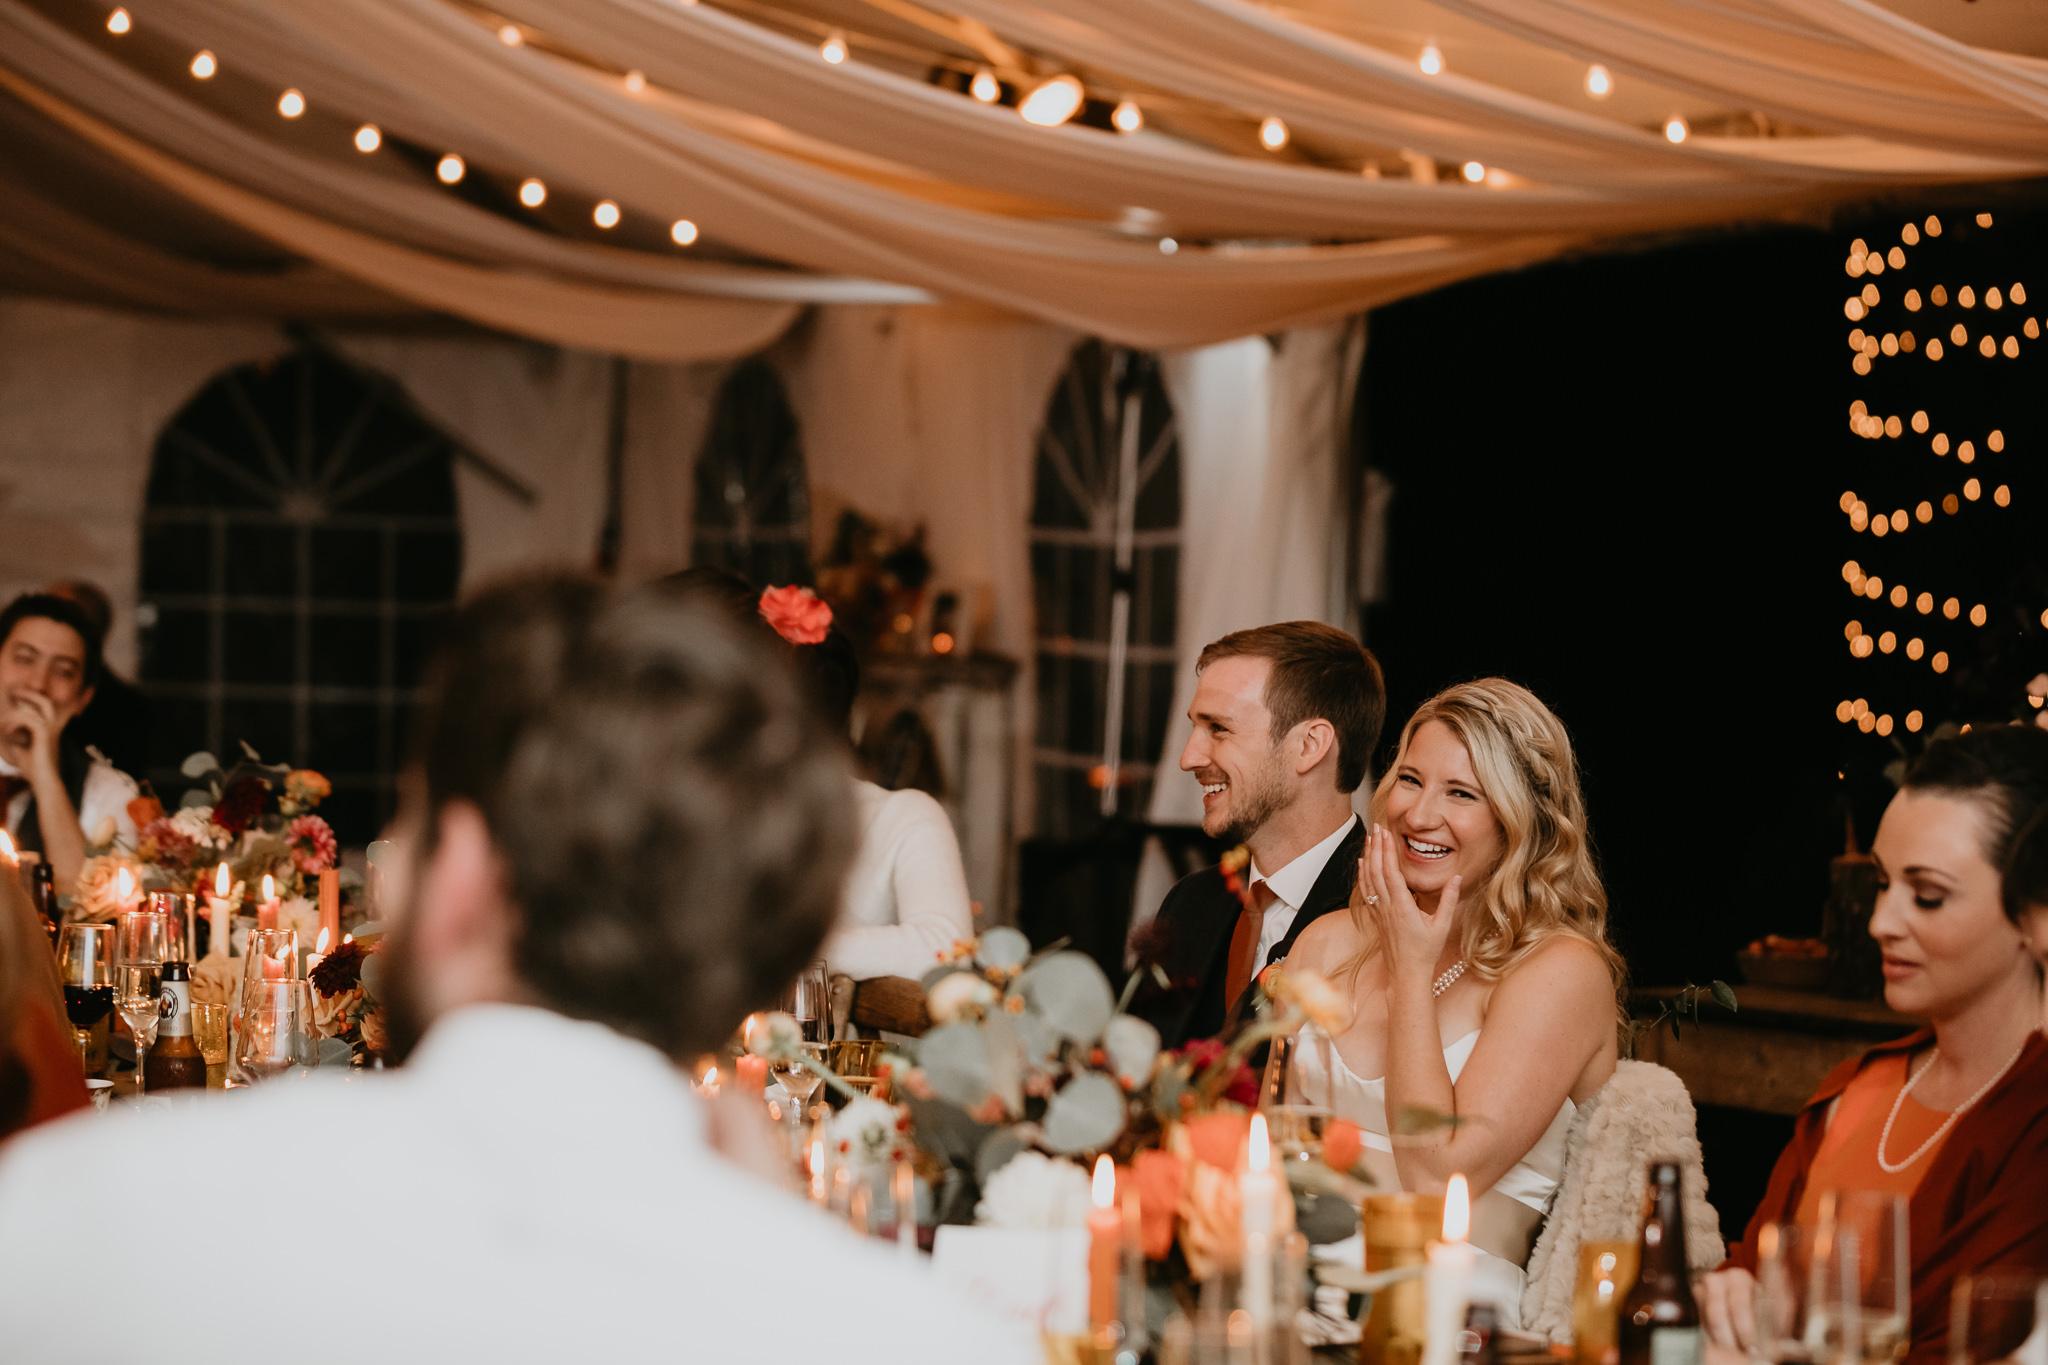 Sundara - Weddings - Virginia - Best Wedding Photographer - Pat Cori Photography-89.jpg